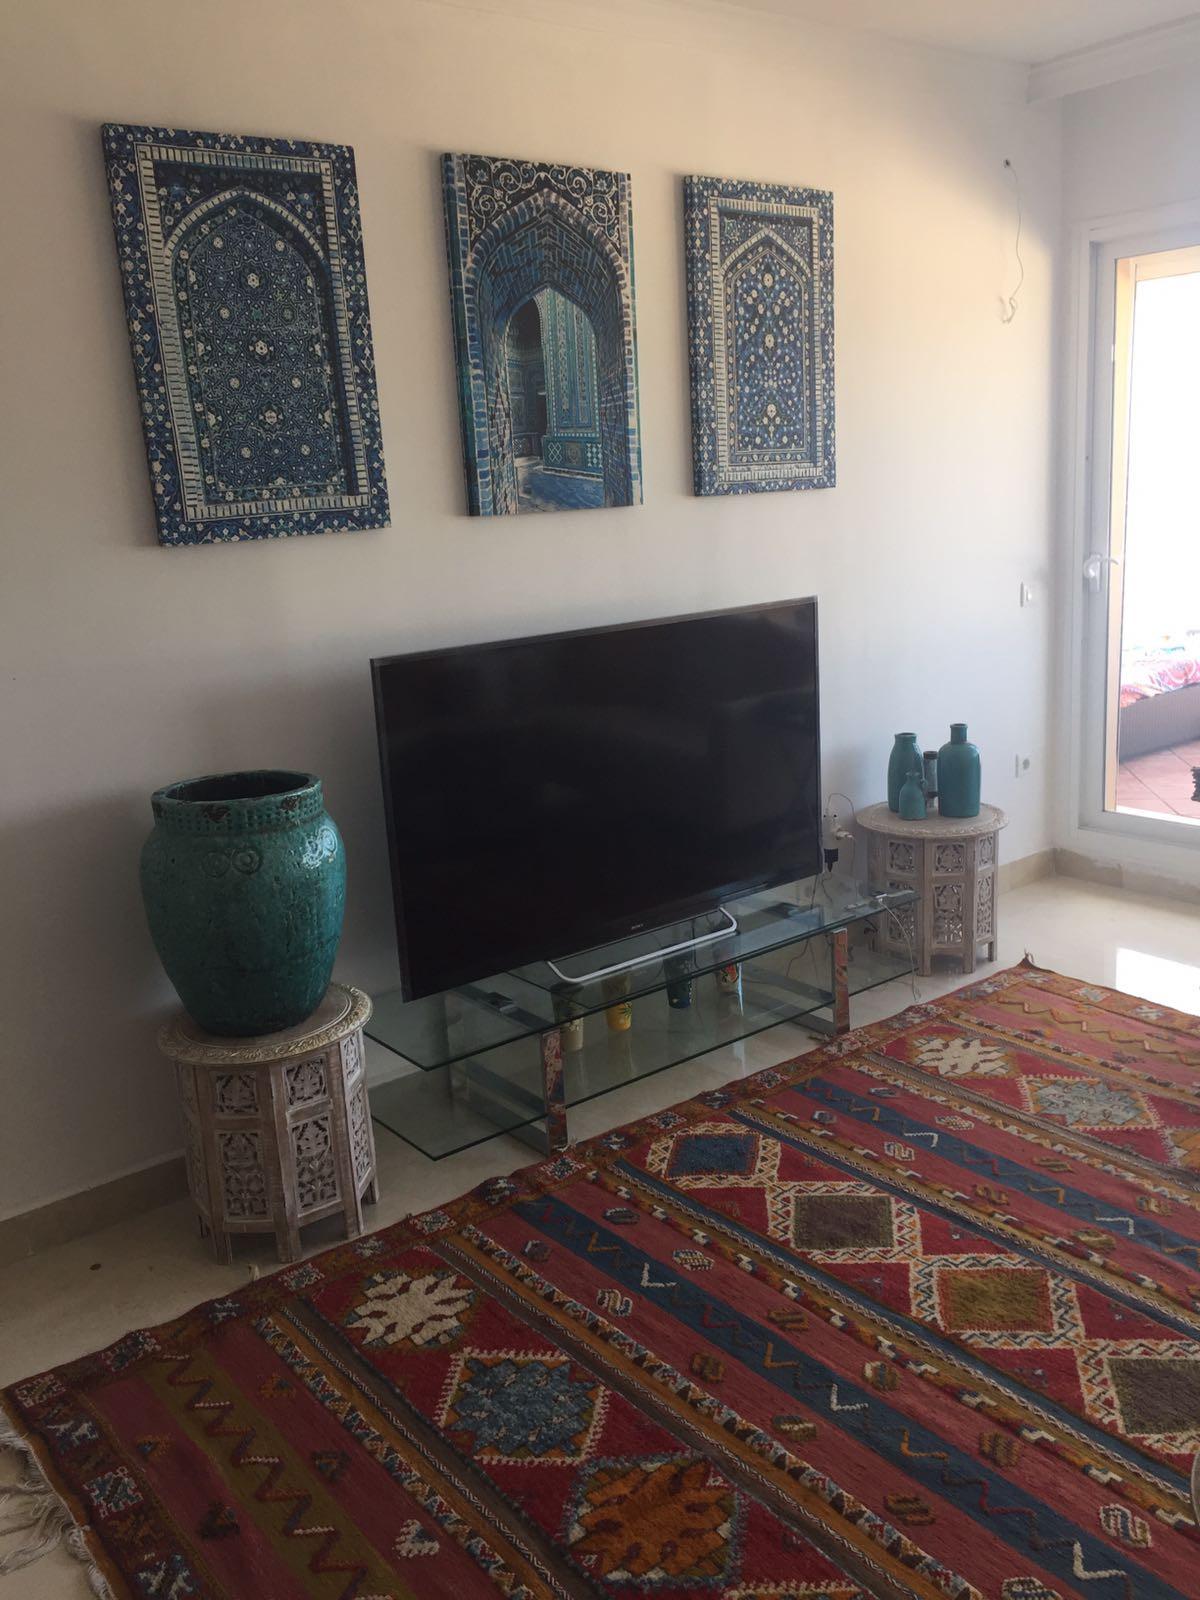 2 Bedroom Apartment for sale Elviria